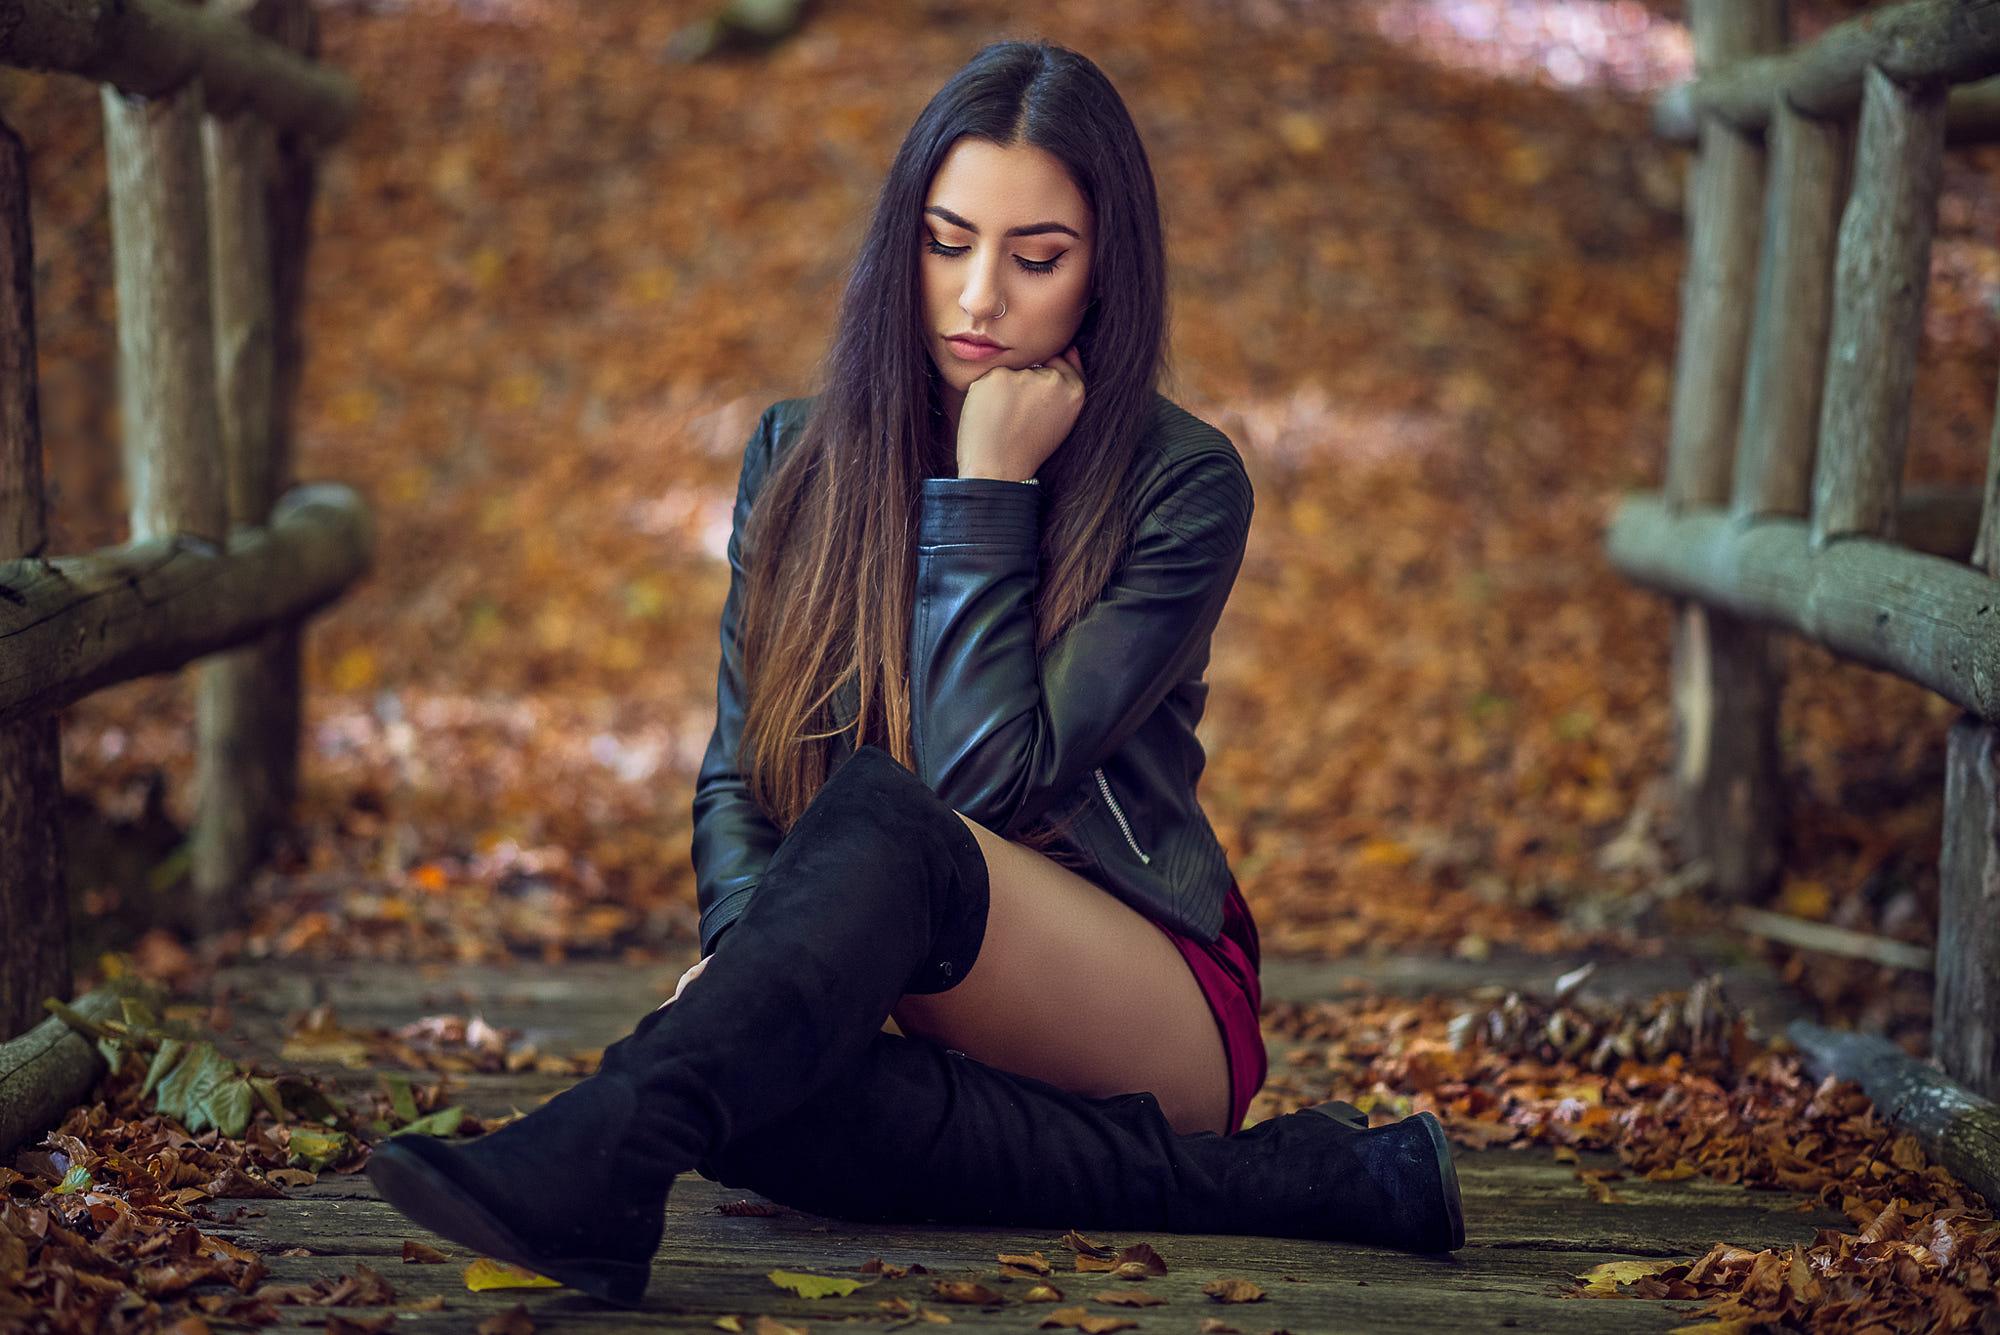 симпатичная девушка сидит на лице - 2